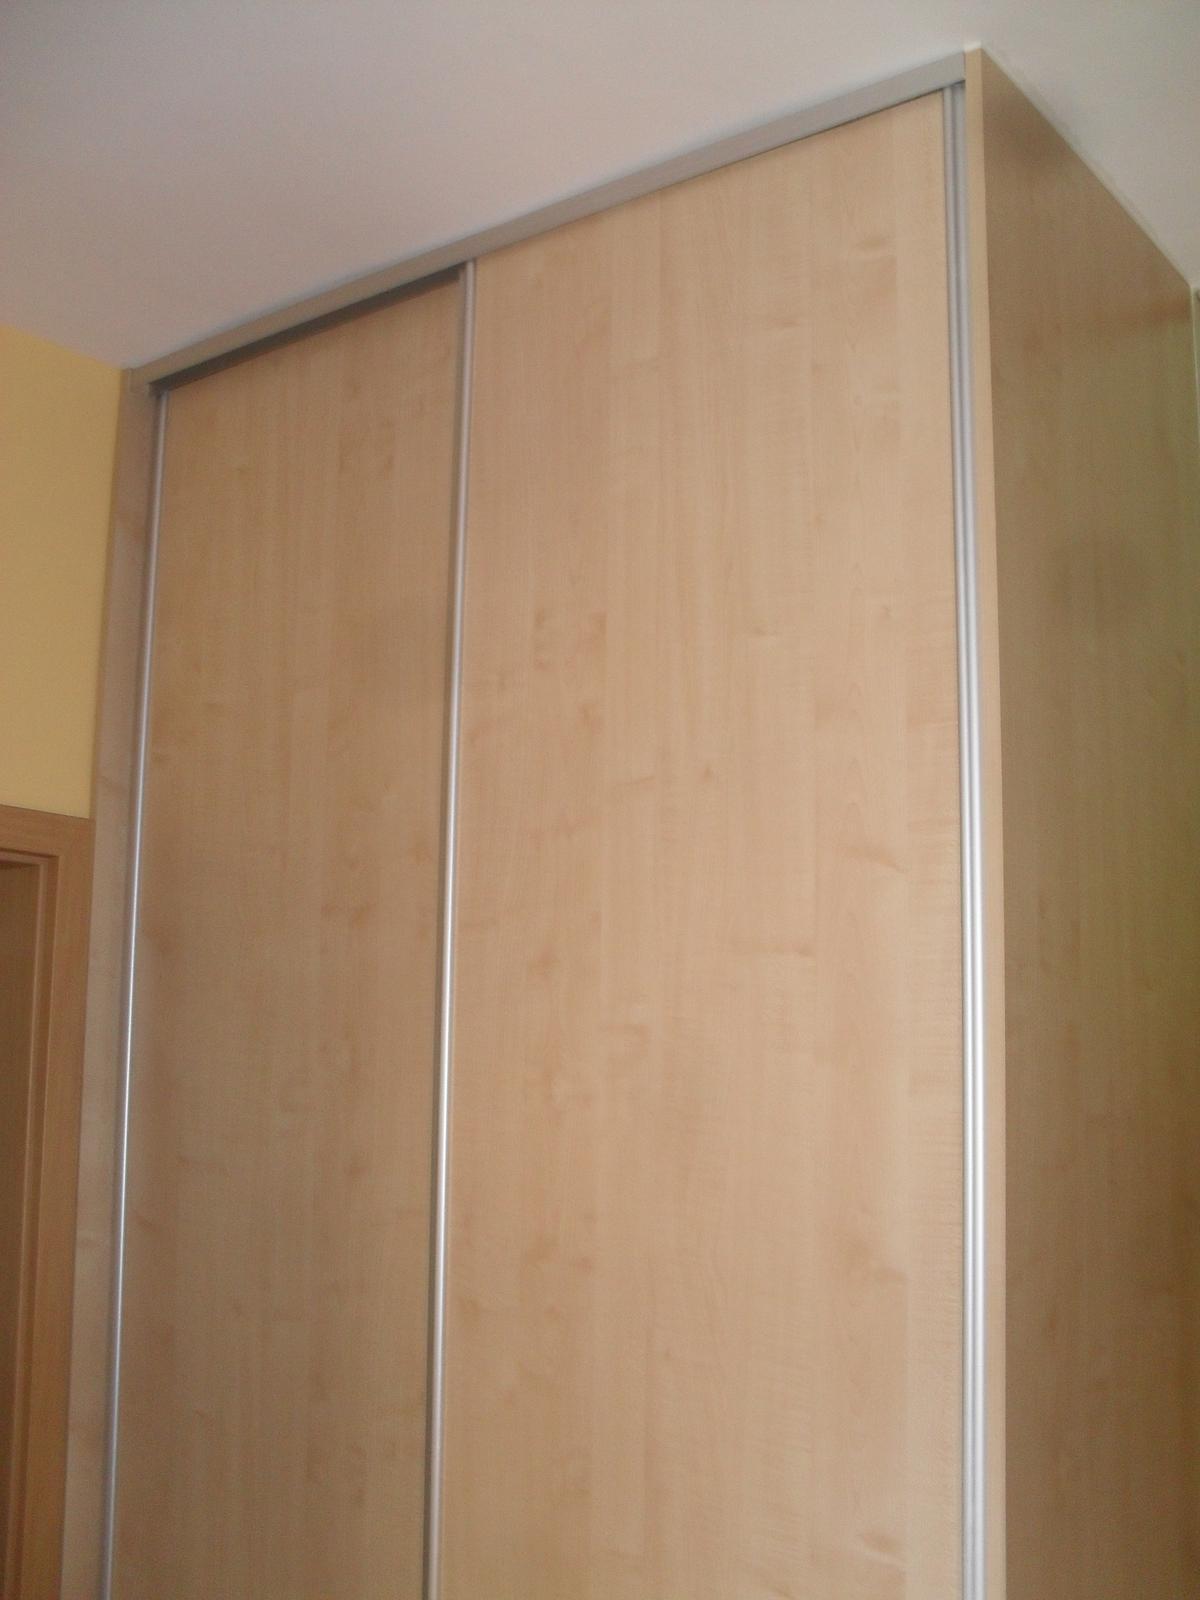 Vstavané skrine Martin Benko Bošany - Obrázok č. 90